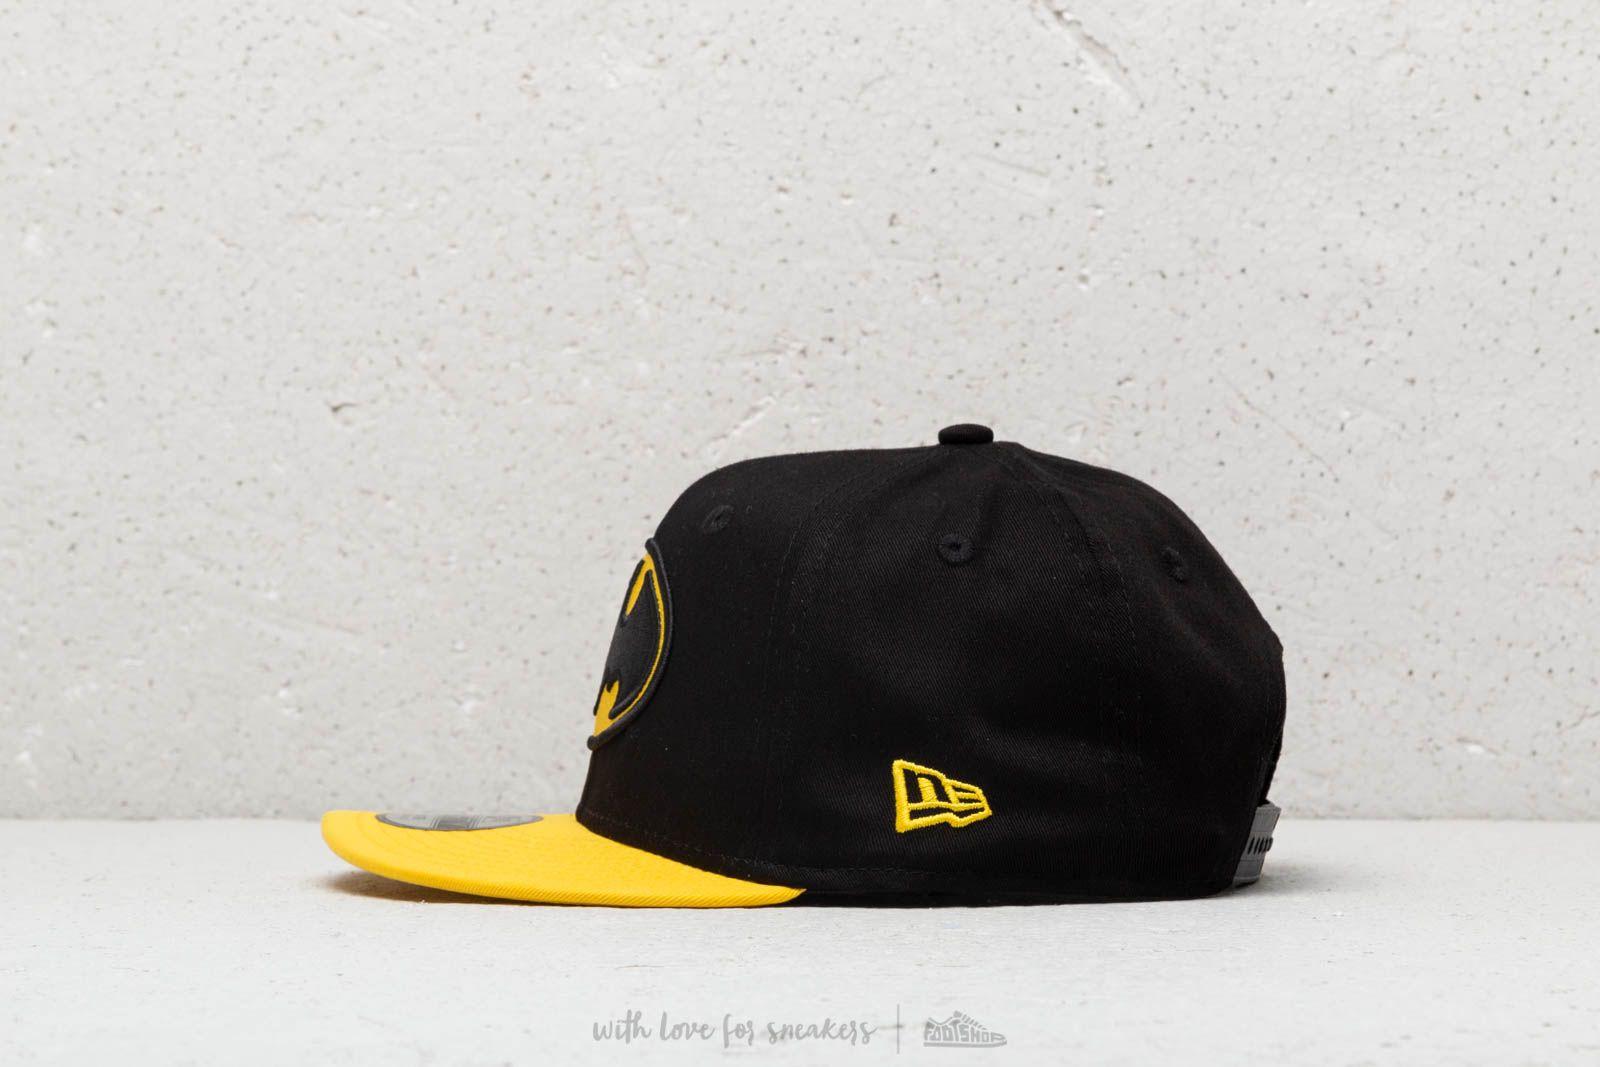 ca4c3e53d73 New Era Kids Essential Batman Snapback Black  Yellow at a great price  30  buy at